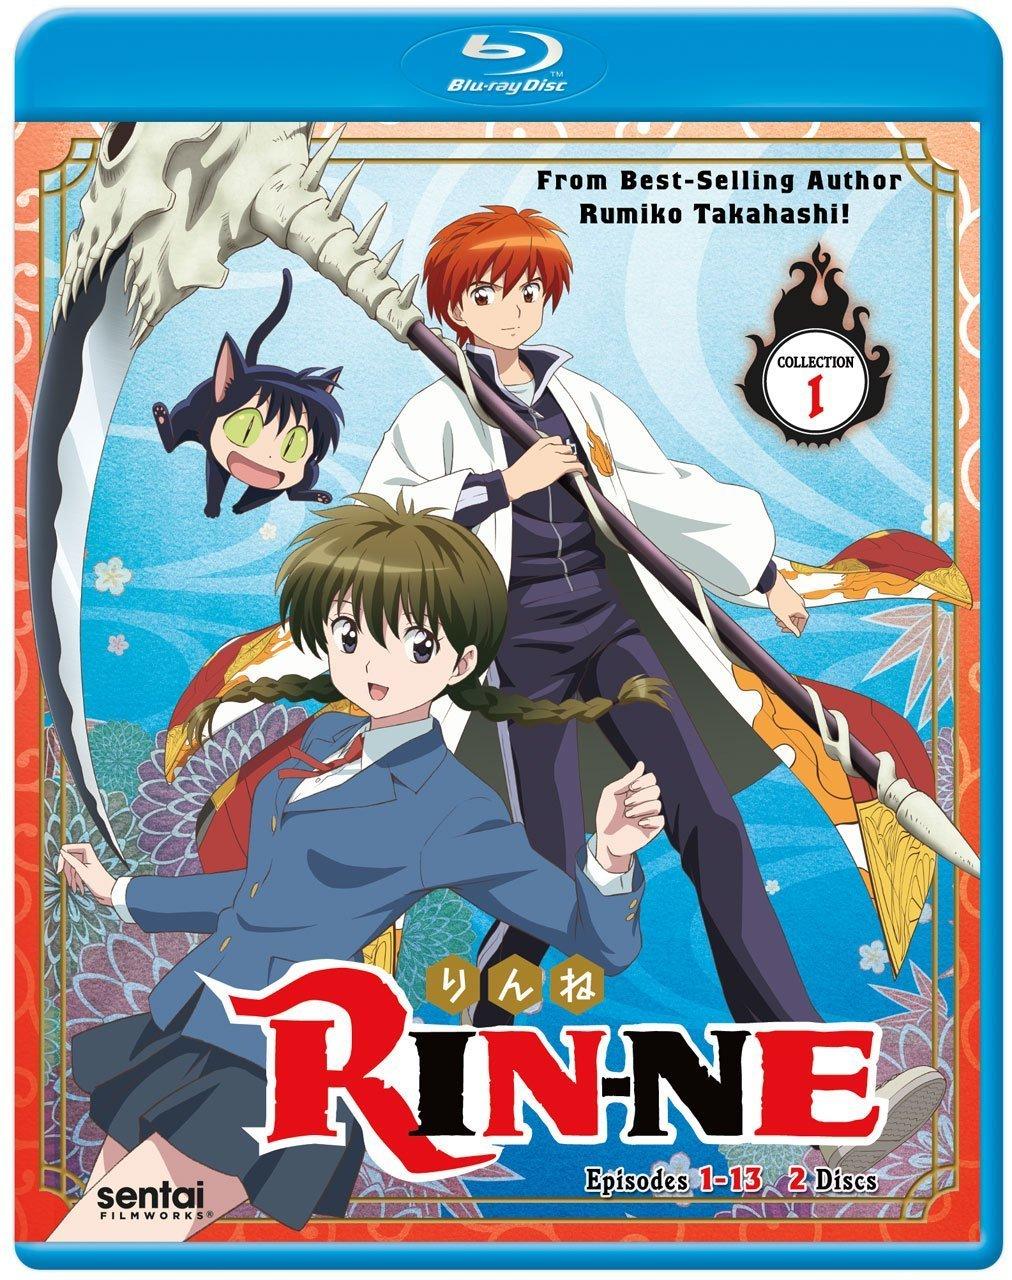 rin-ne-collection-1-box-art